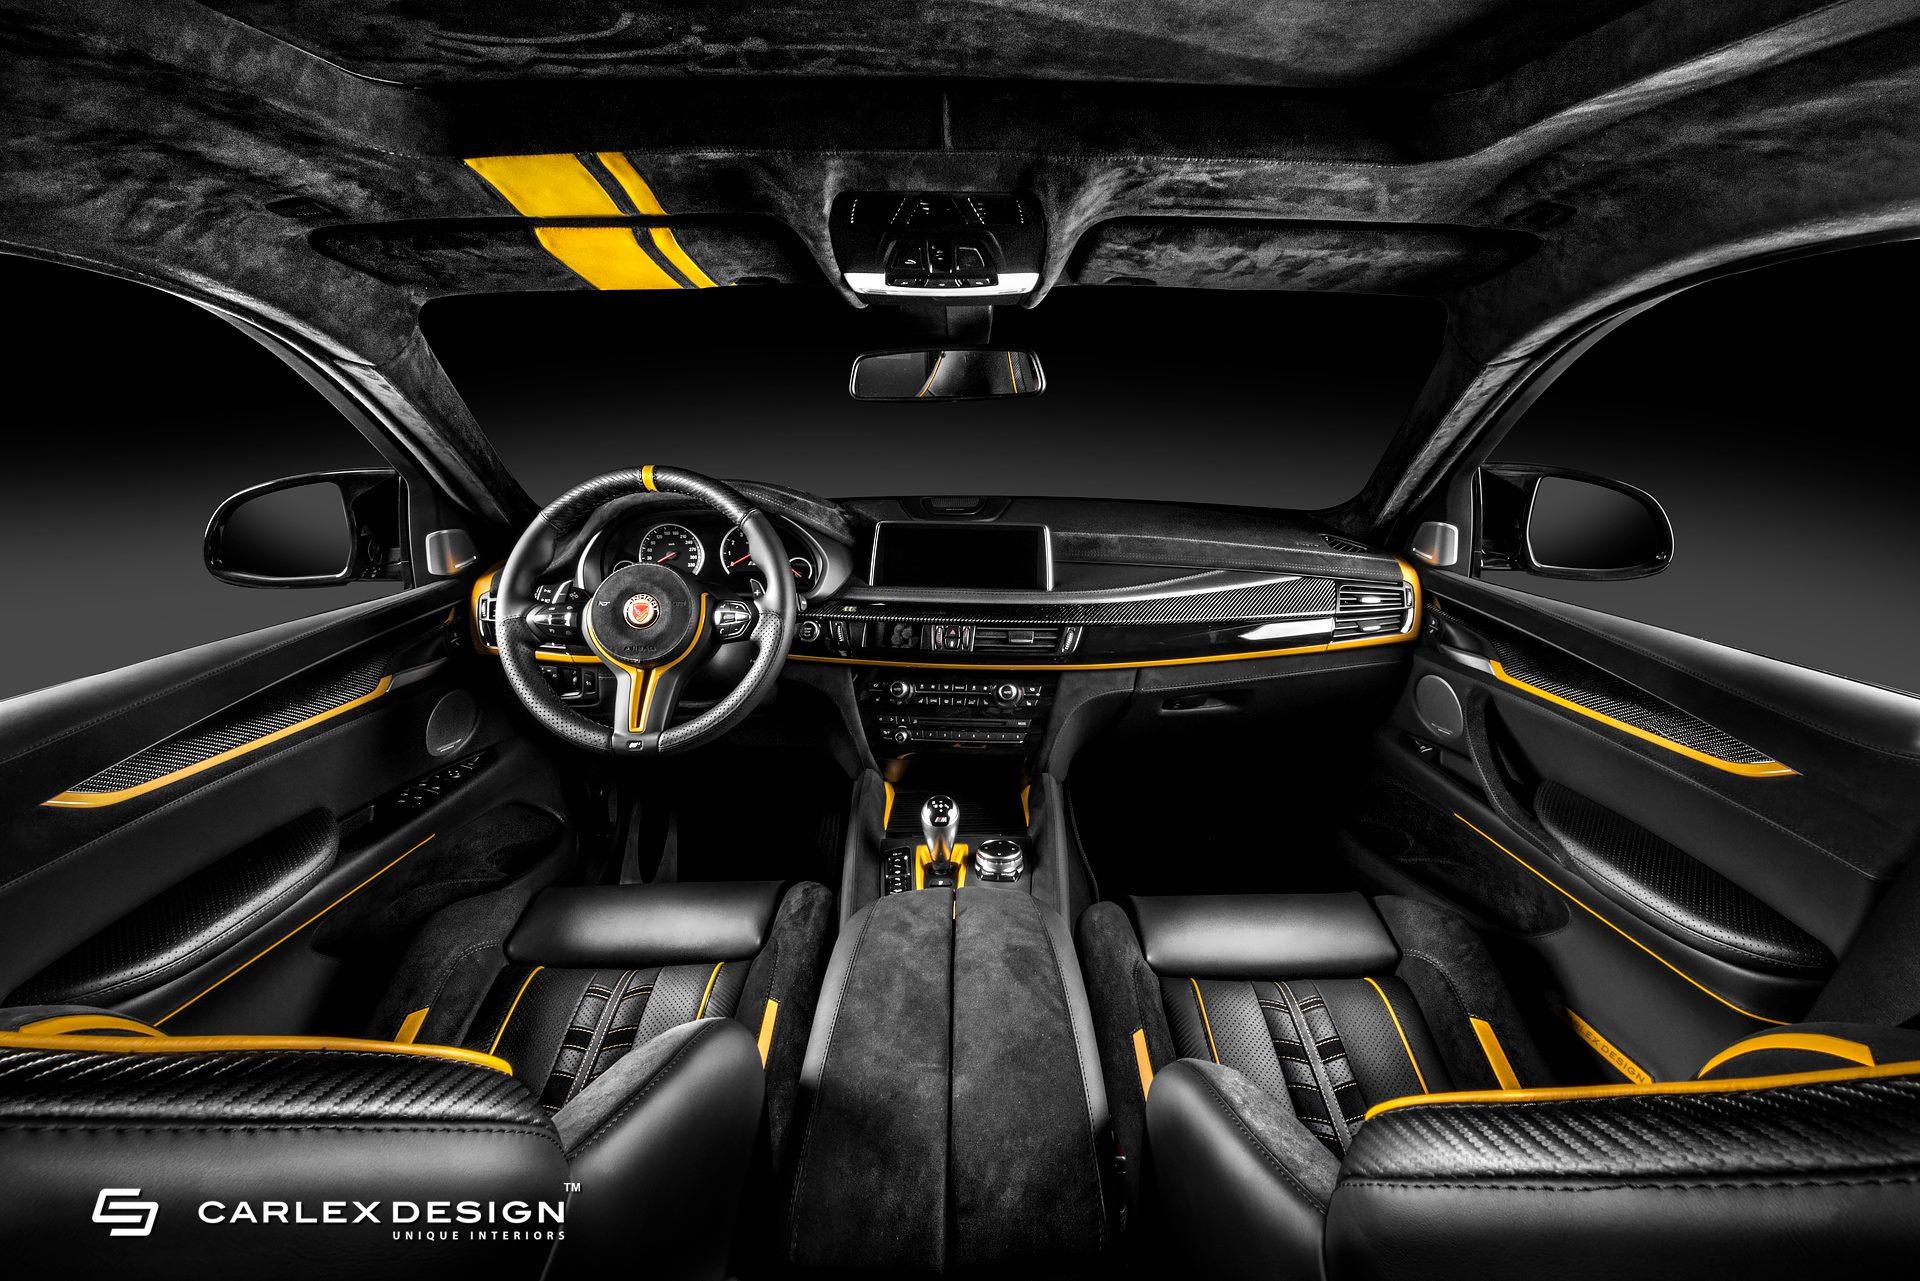 BMW X6M by Manhart and Carlex Design